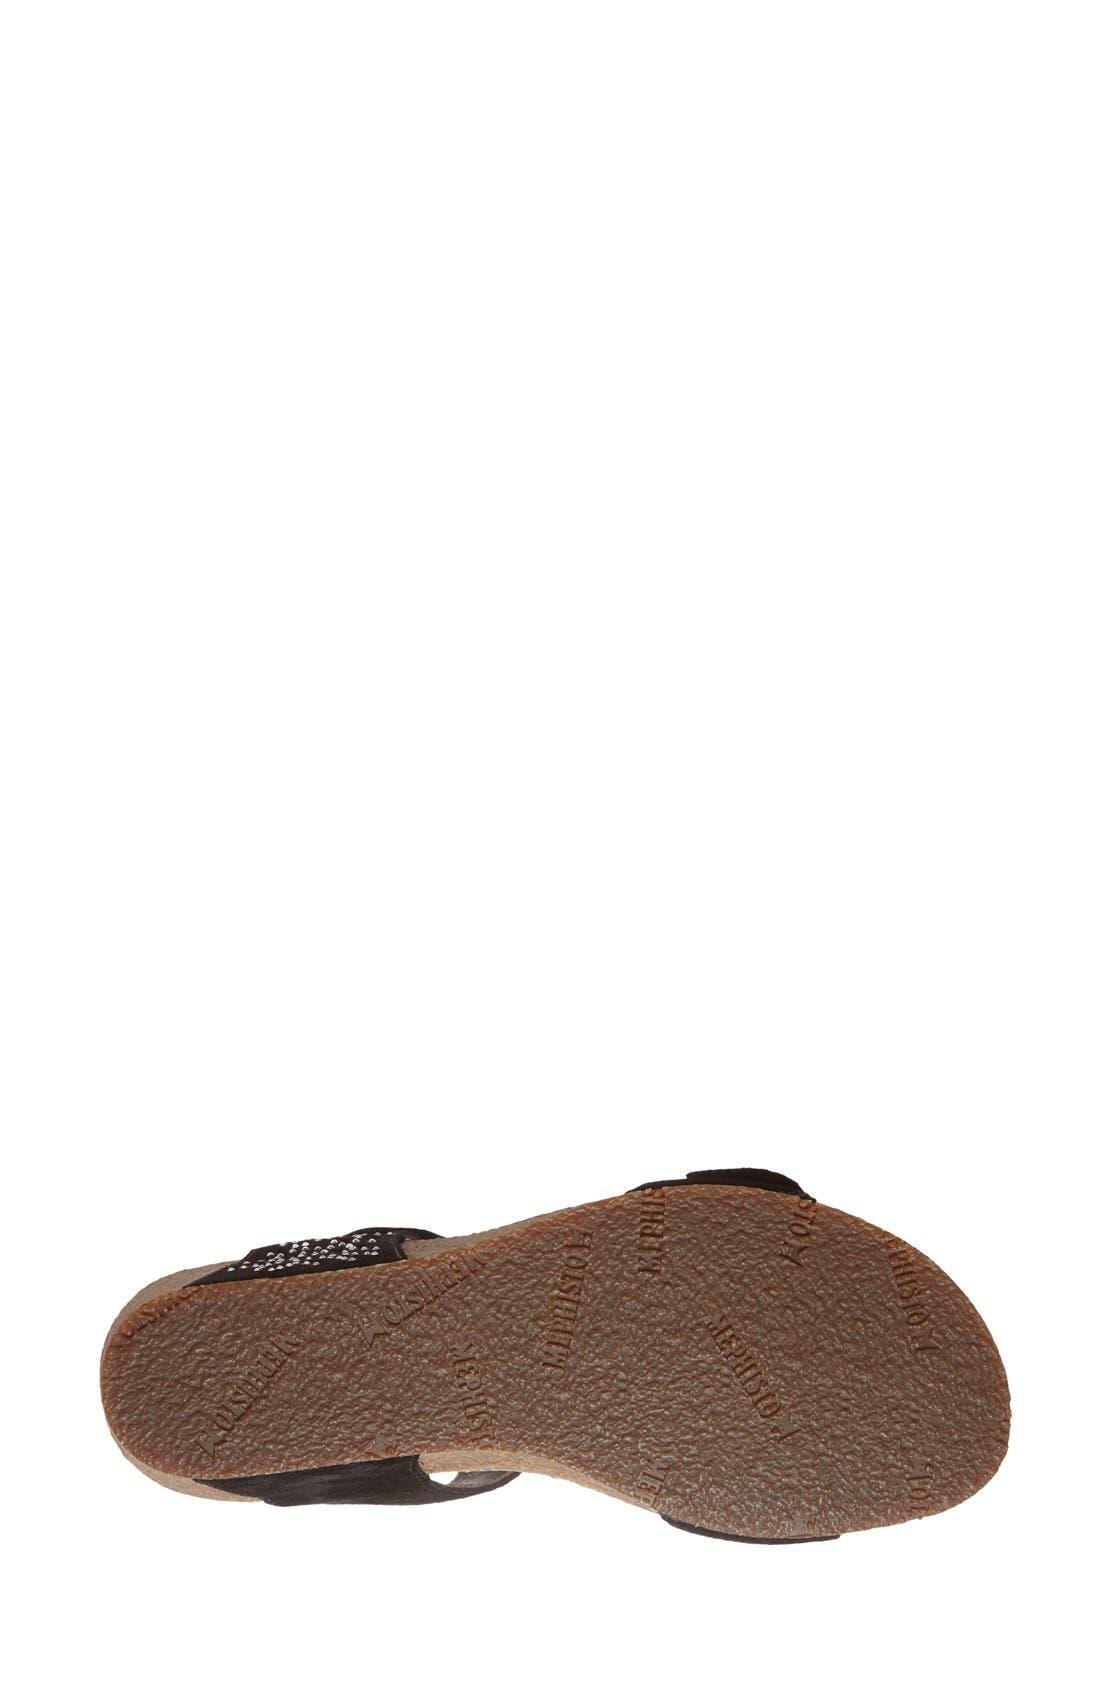 'Marie - Spark' Wedge Sandal,                             Alternate thumbnail 4, color,                             Black Suede